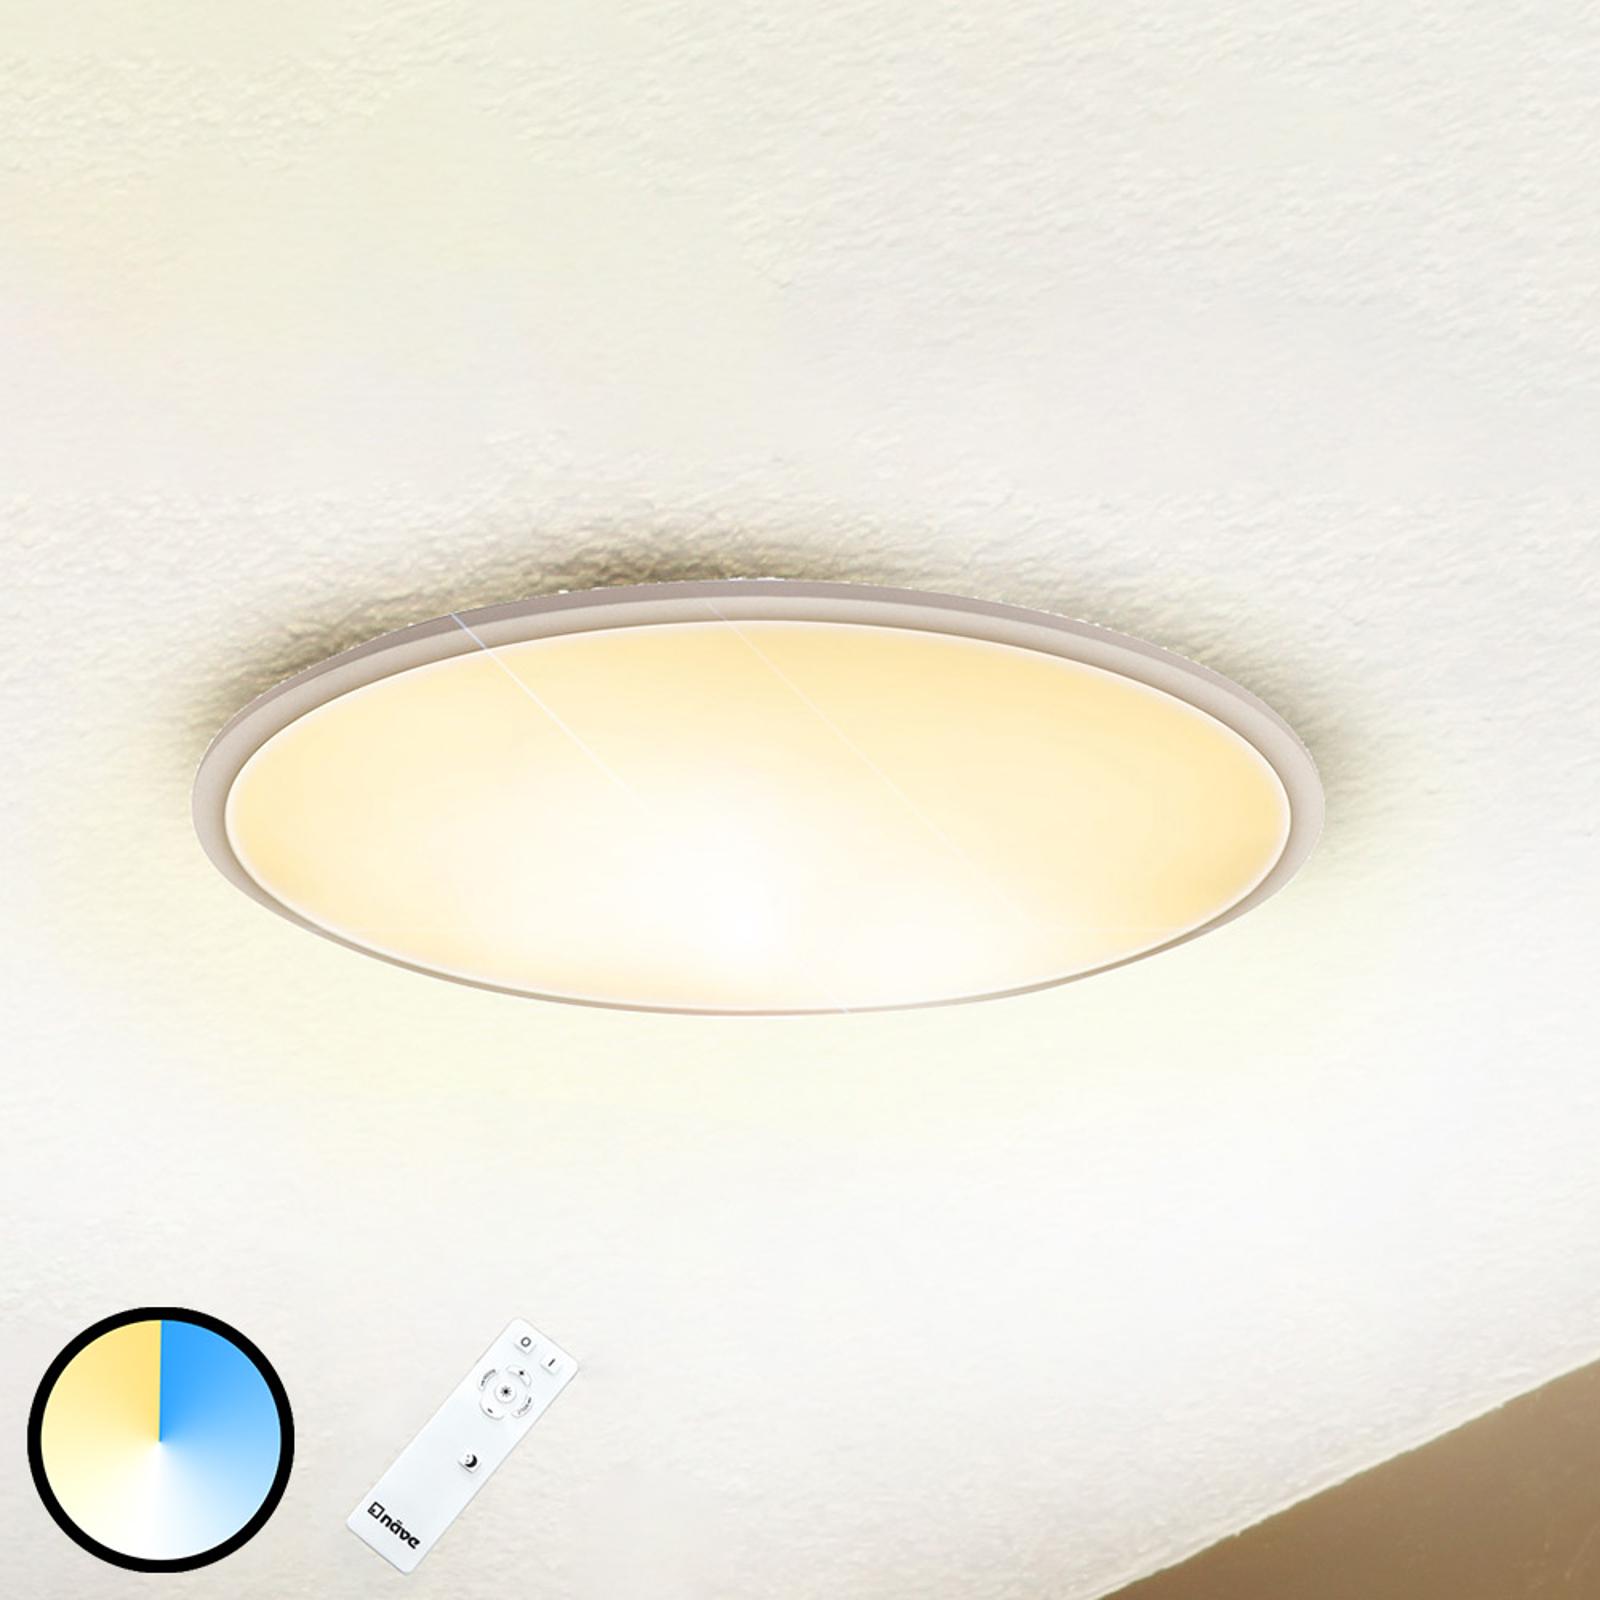 Lampa sufitowa LED Sorrent owal 60 cm x 30 cm